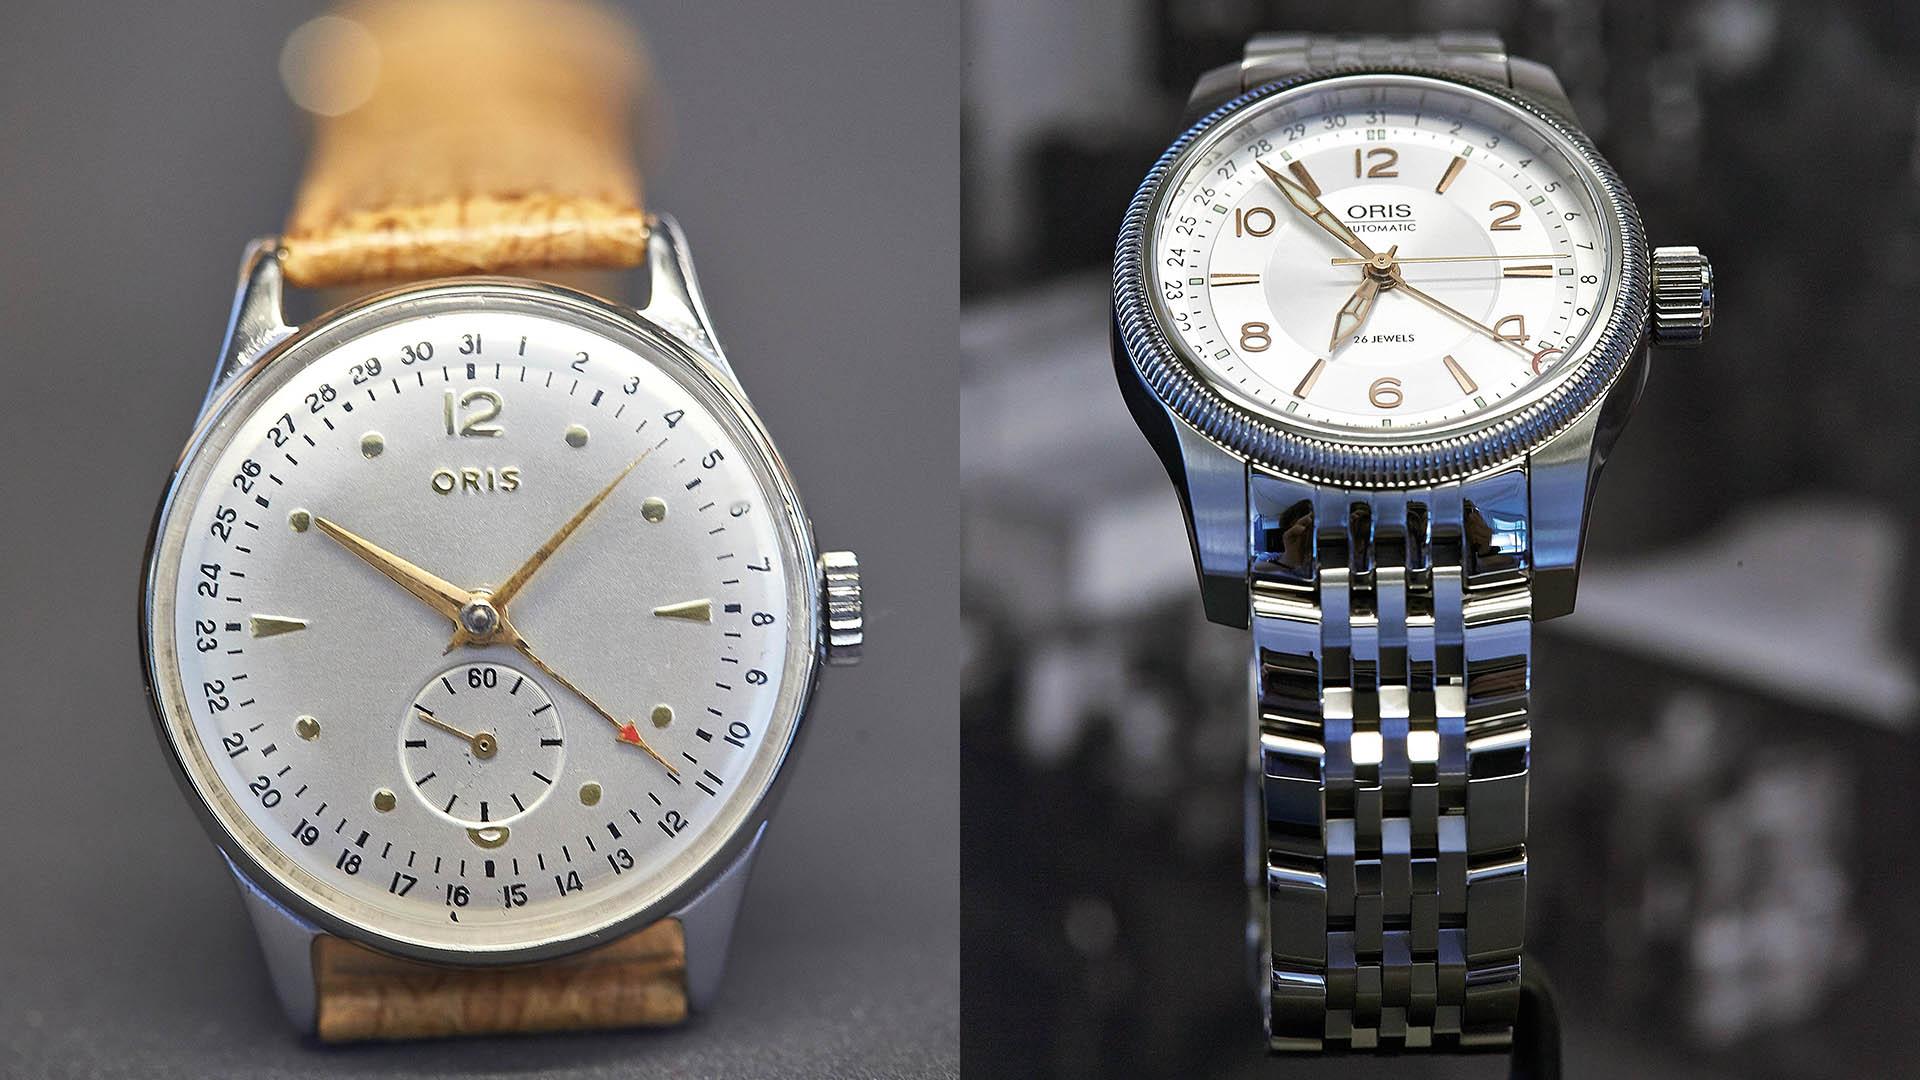 Oris Armbanduhr mit Zeigerdatum, 1970er / 1980er, Uhrenhersteller